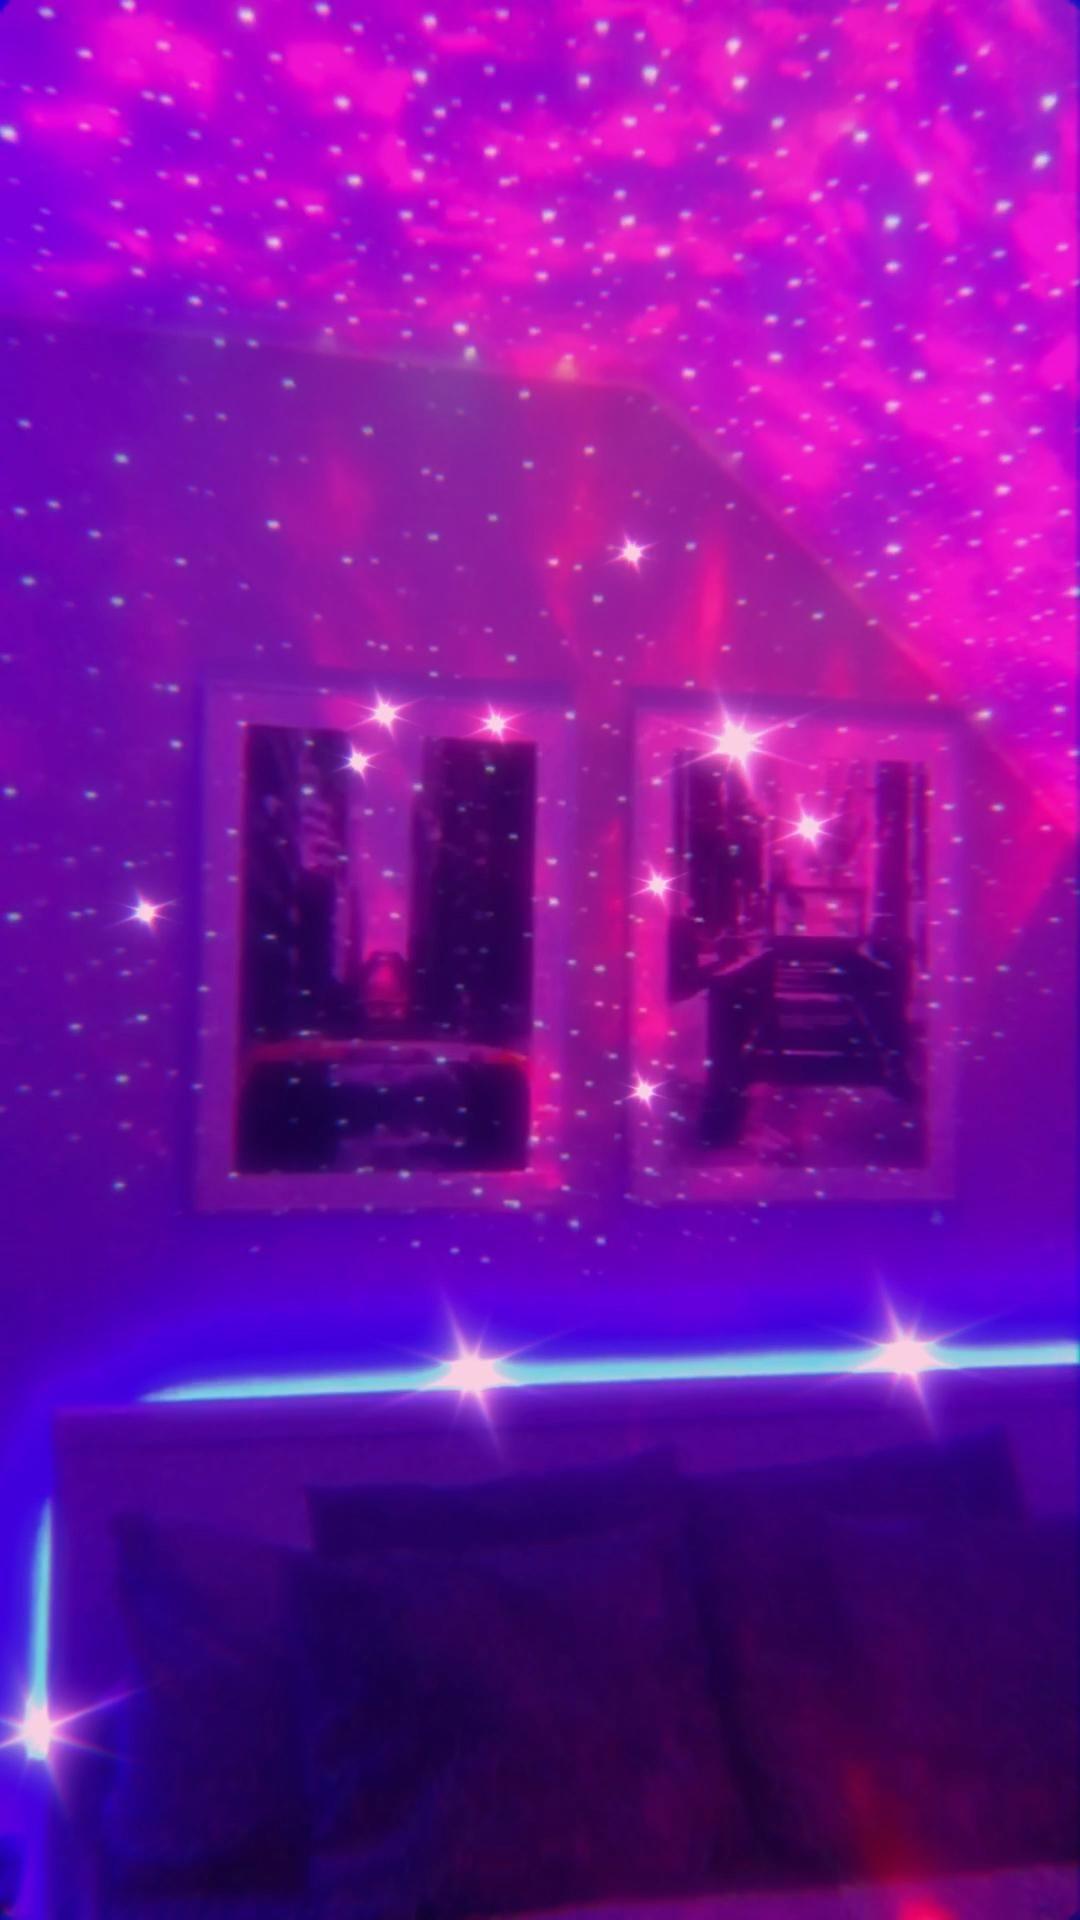 Video Tiktok Room Aesthetic Room Makeover Kamar Tidur Kamar Tidur Neon Dekorasi Kamar Tidur Remaja